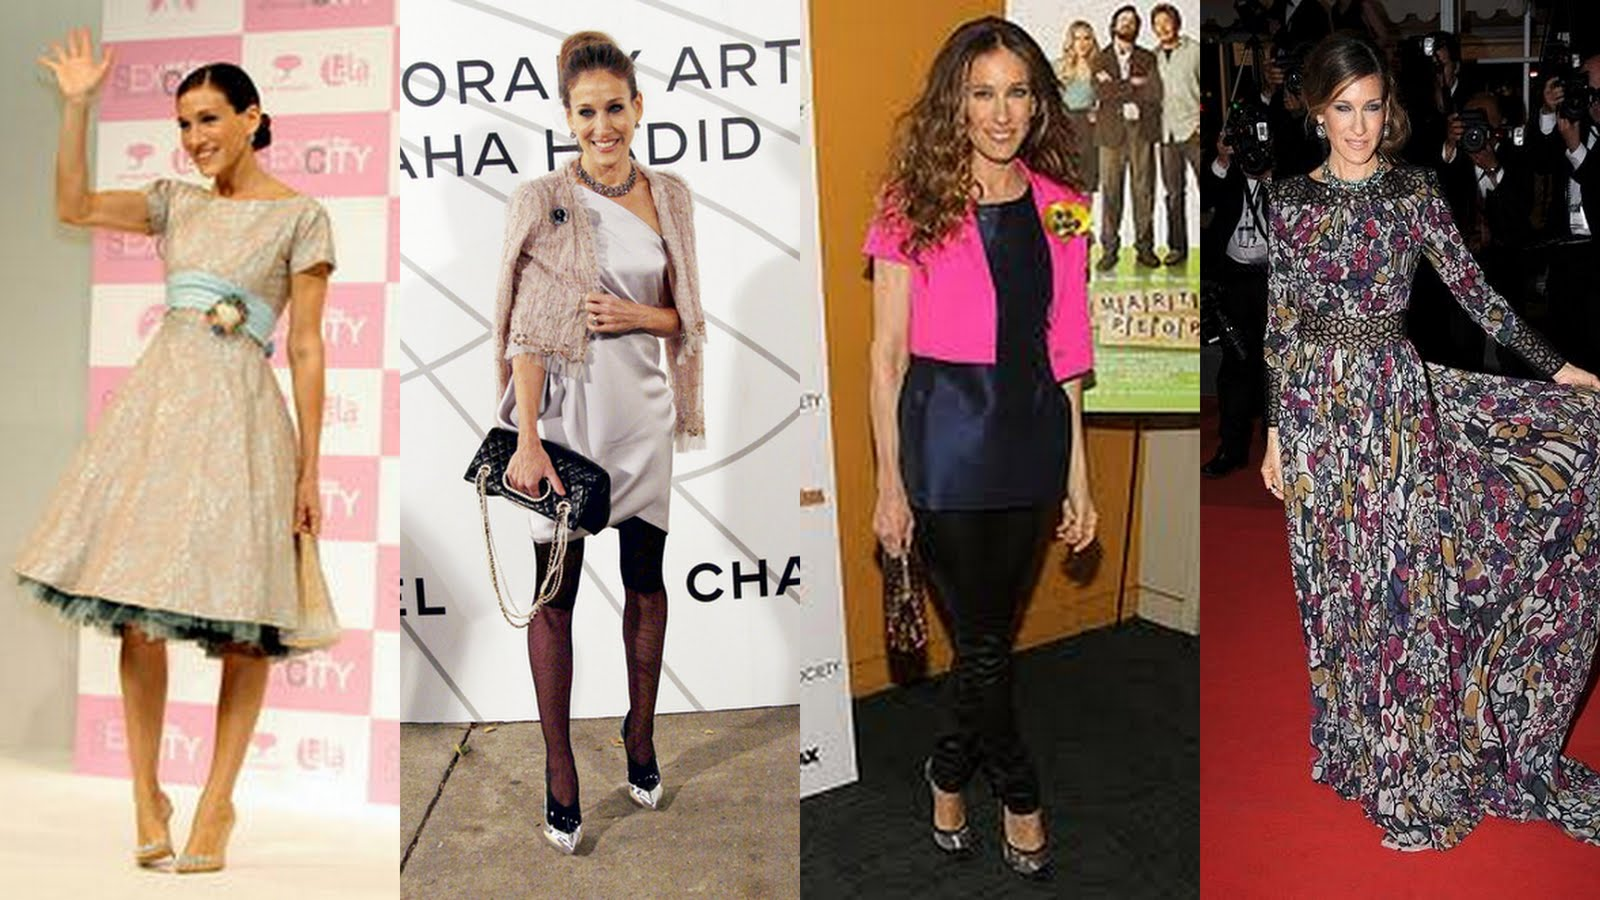 http://2.bp.blogspot.com/-xTSlD0Lsm-0/TeE_Evom2PI/AAAAAAAAI_0/C5JNydtca_A/s1600/it+girl-12.jpg